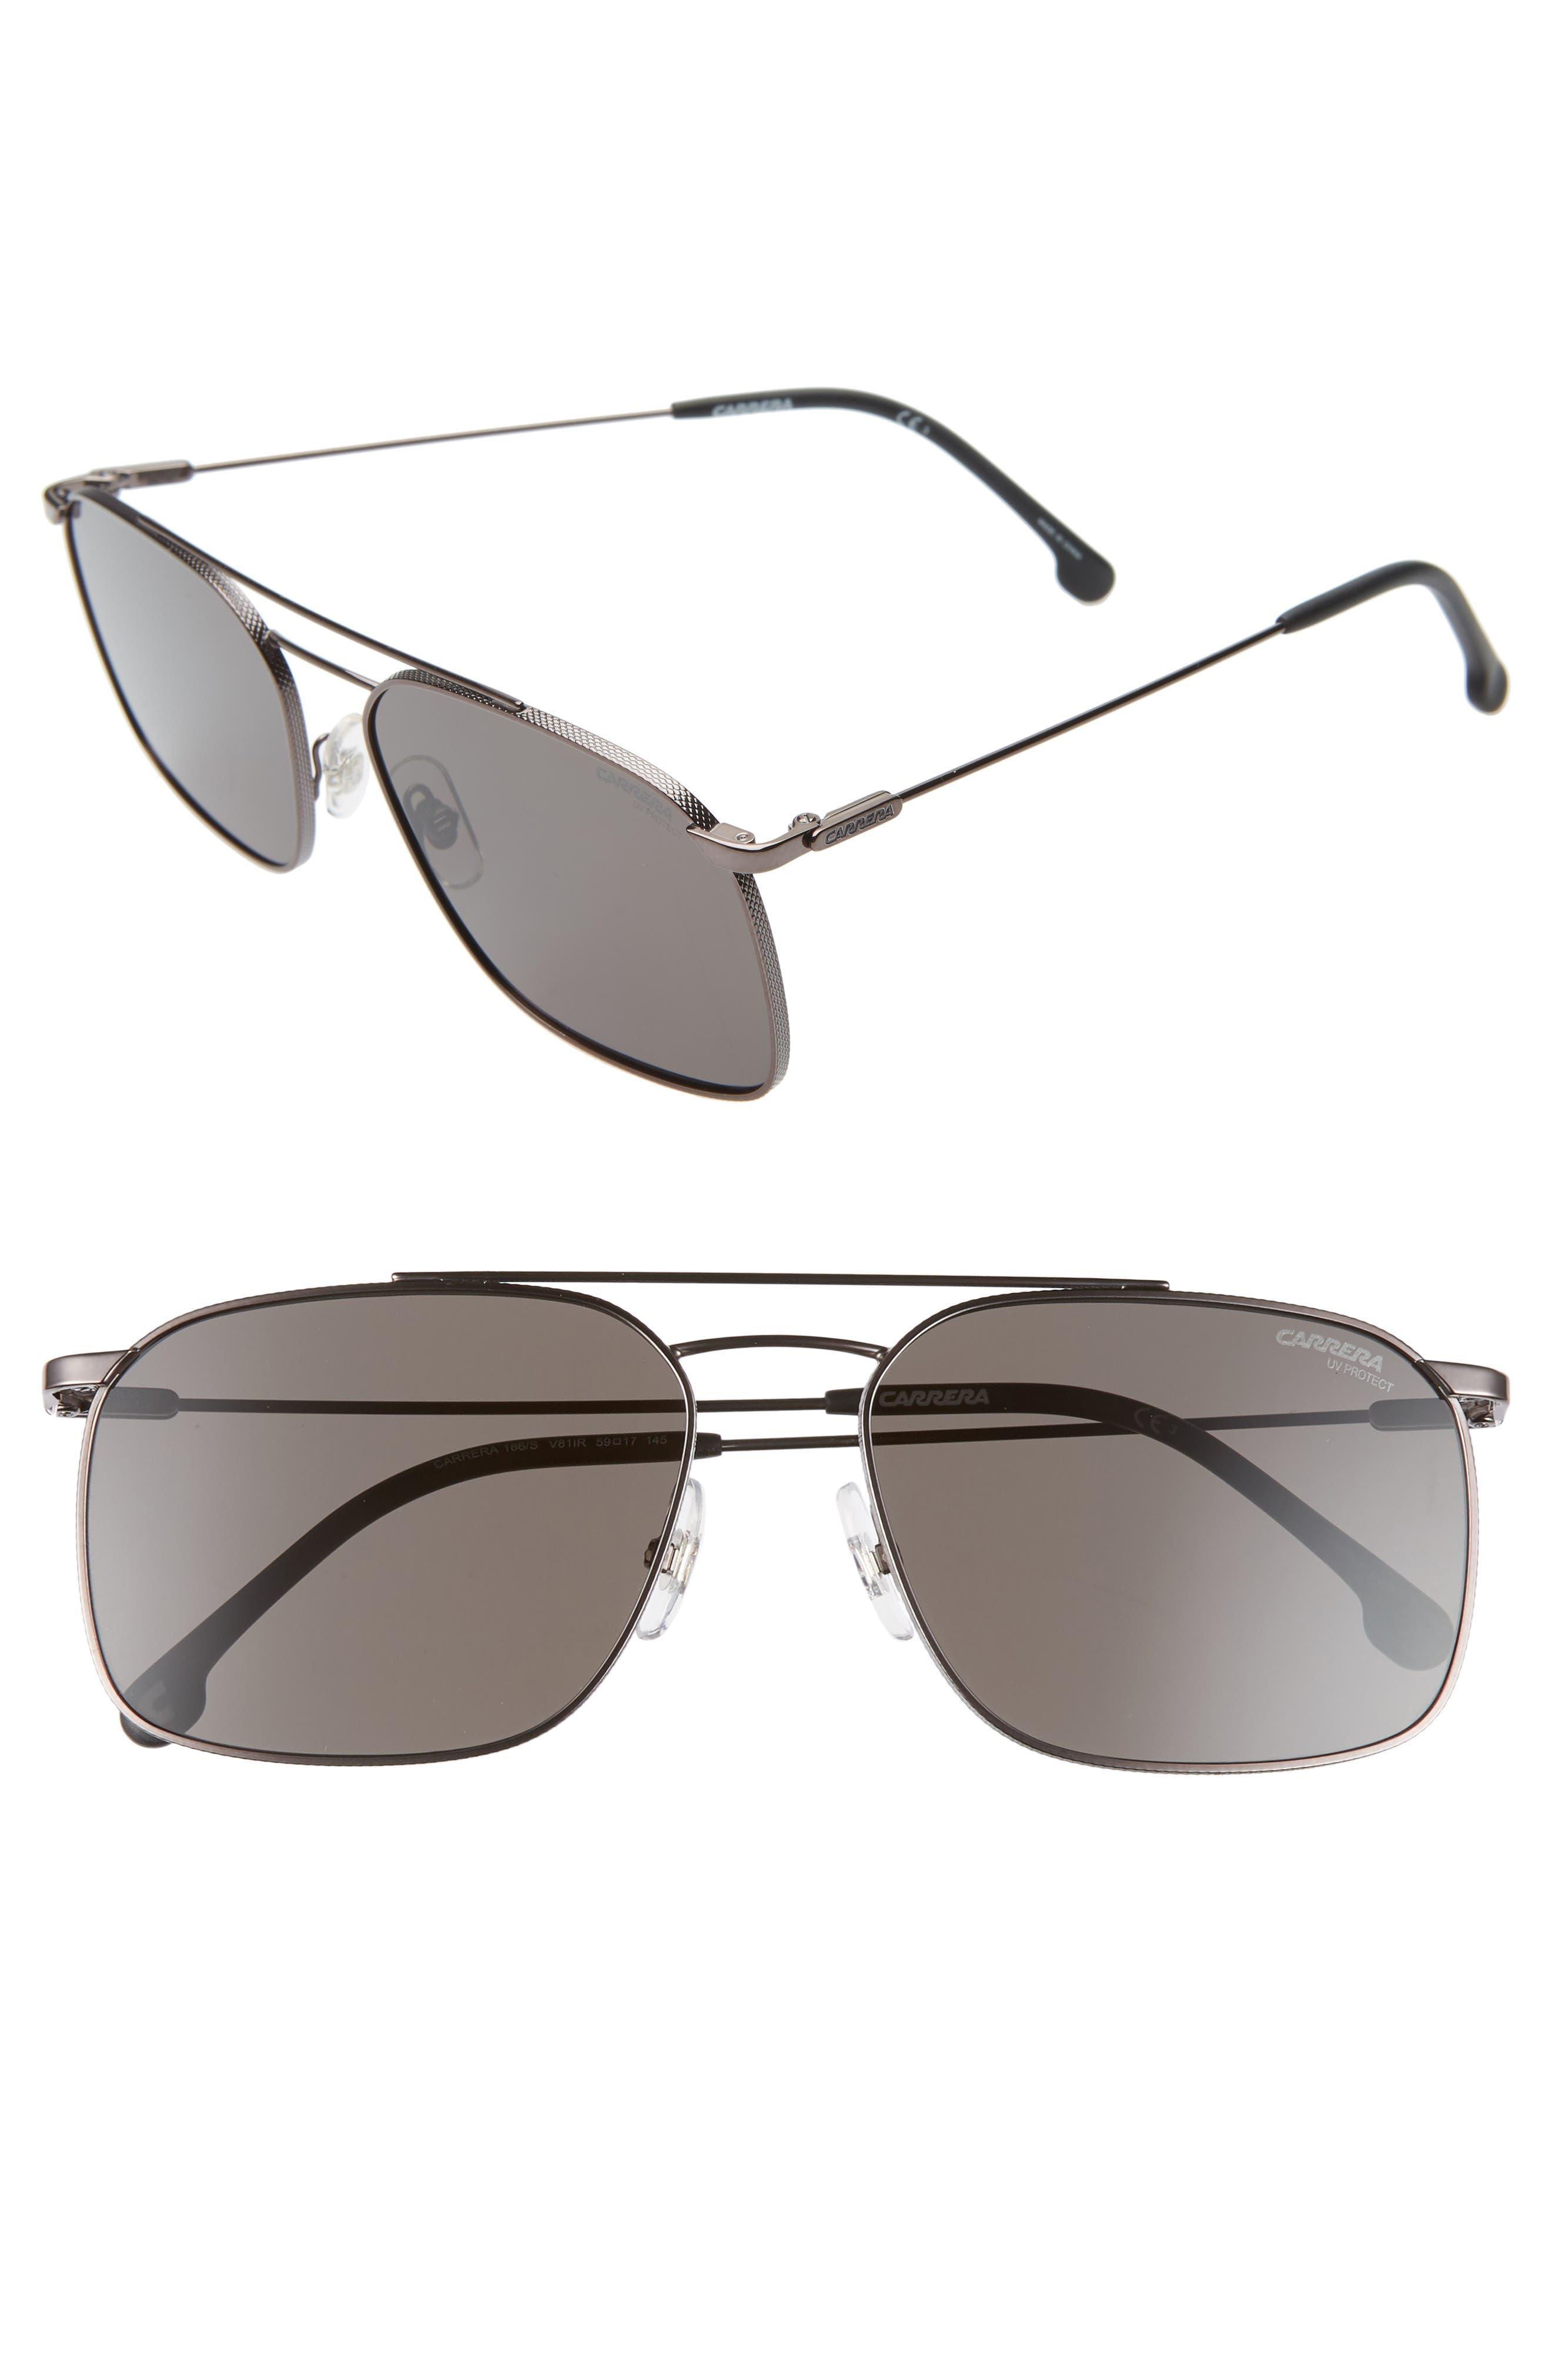 Carrera Eyewear 5m Aviator Sunglasses - Dark Ruthenium Black